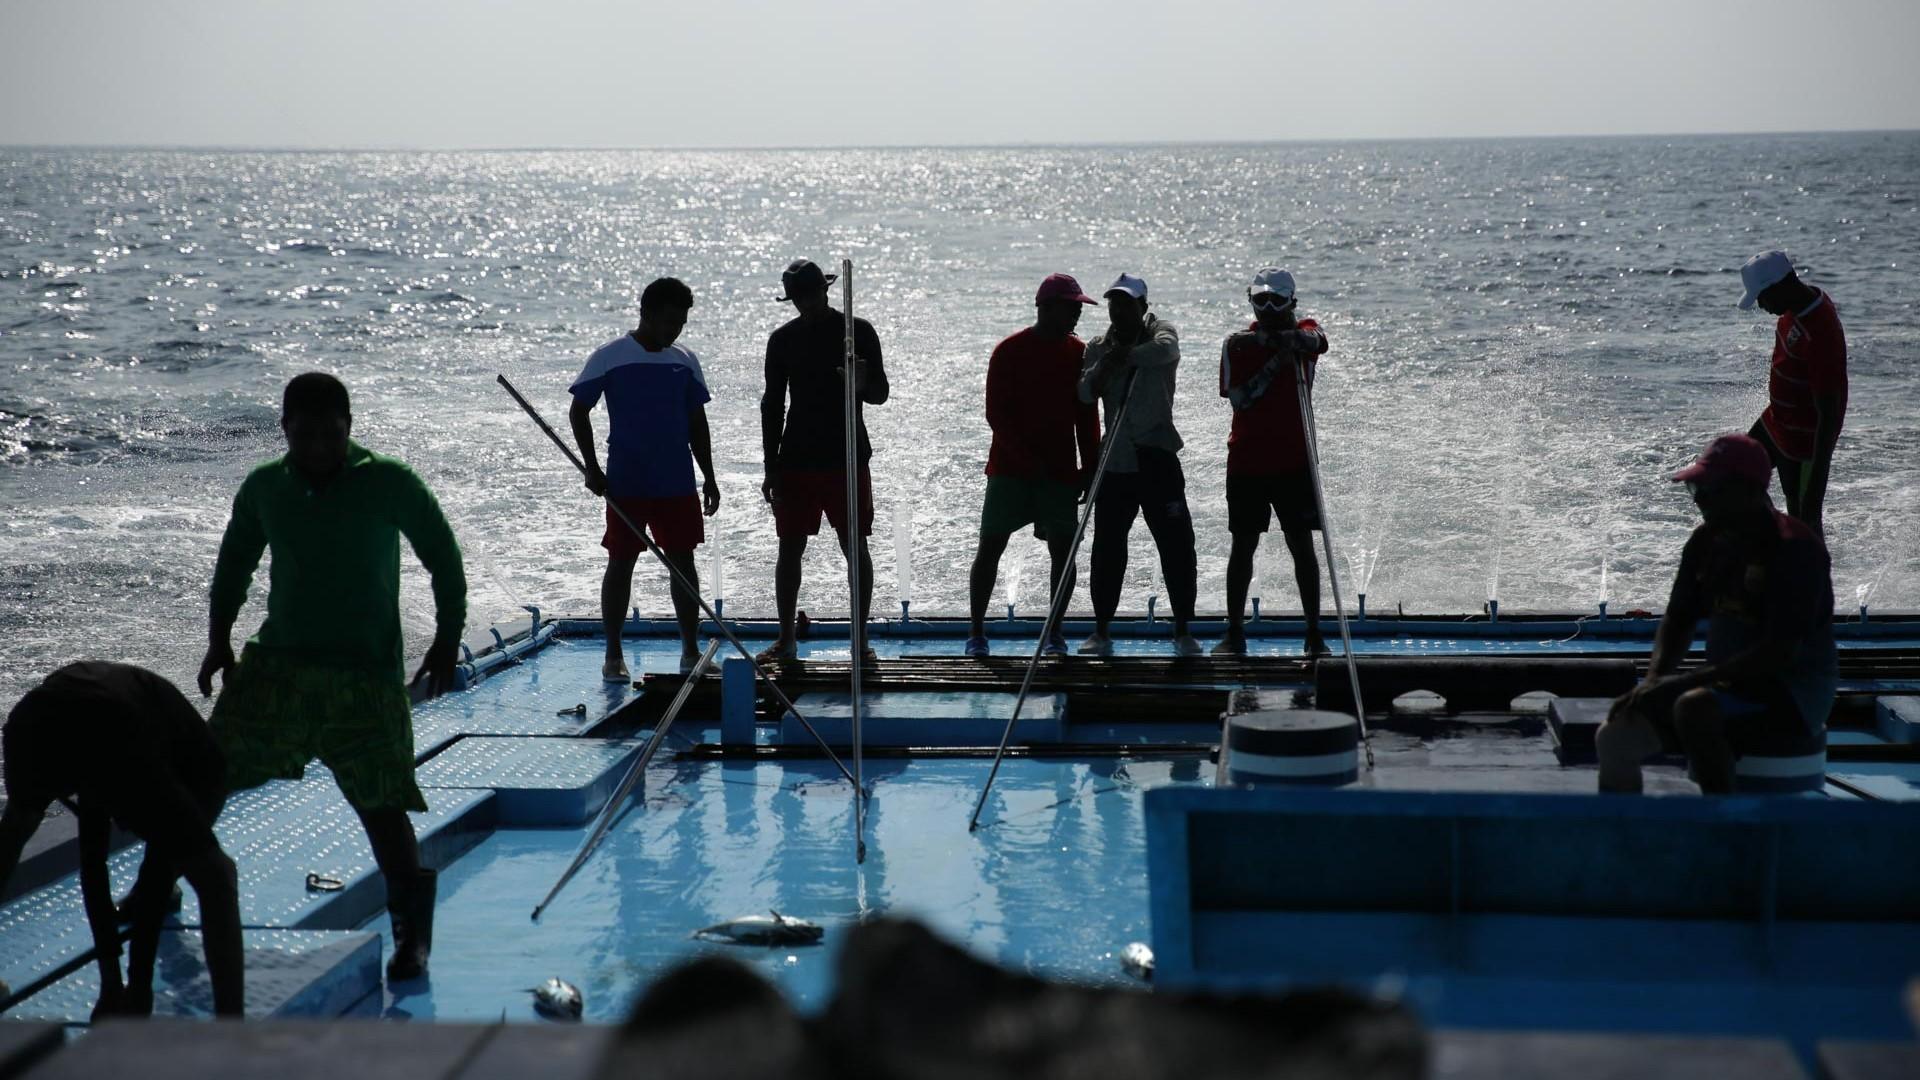 Pole&Line tonijnvisserij op boot (1920x1080)